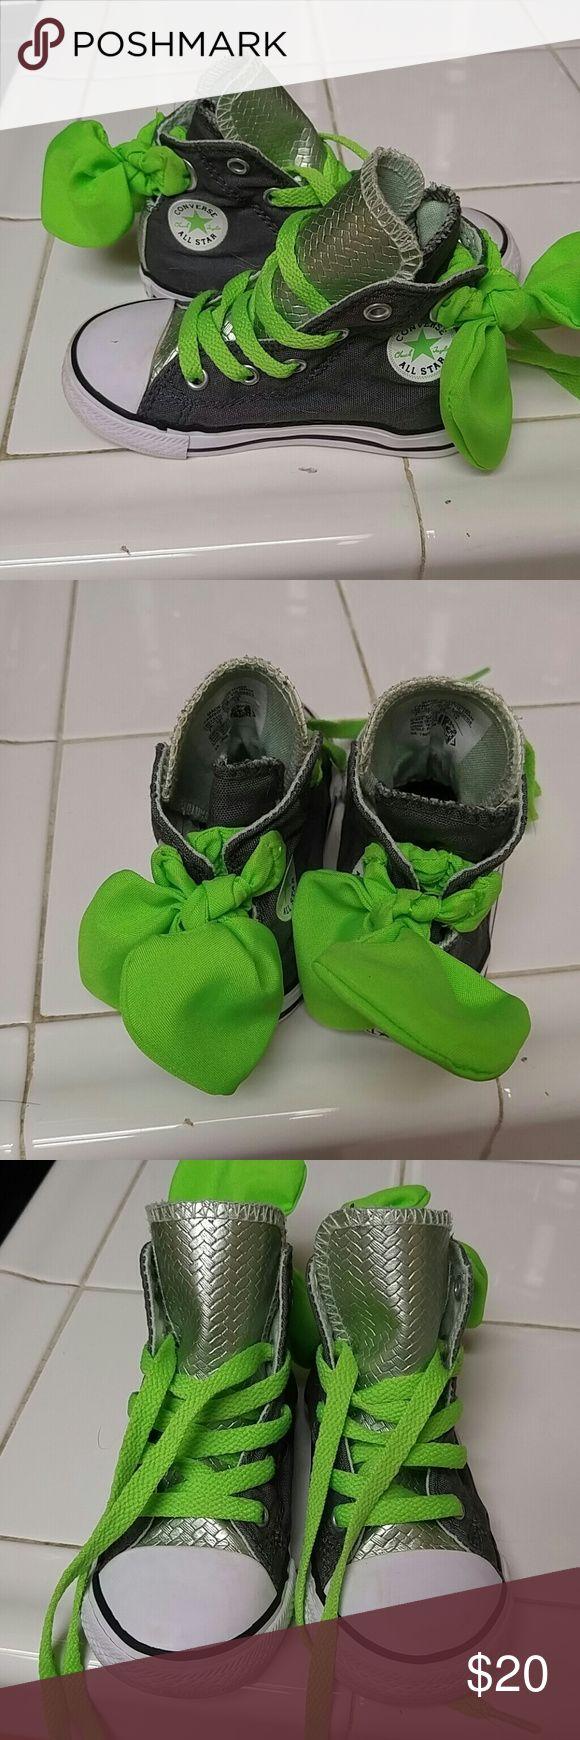 Converse high tops Little girls Converse high tops Converse Shoes Sneakers